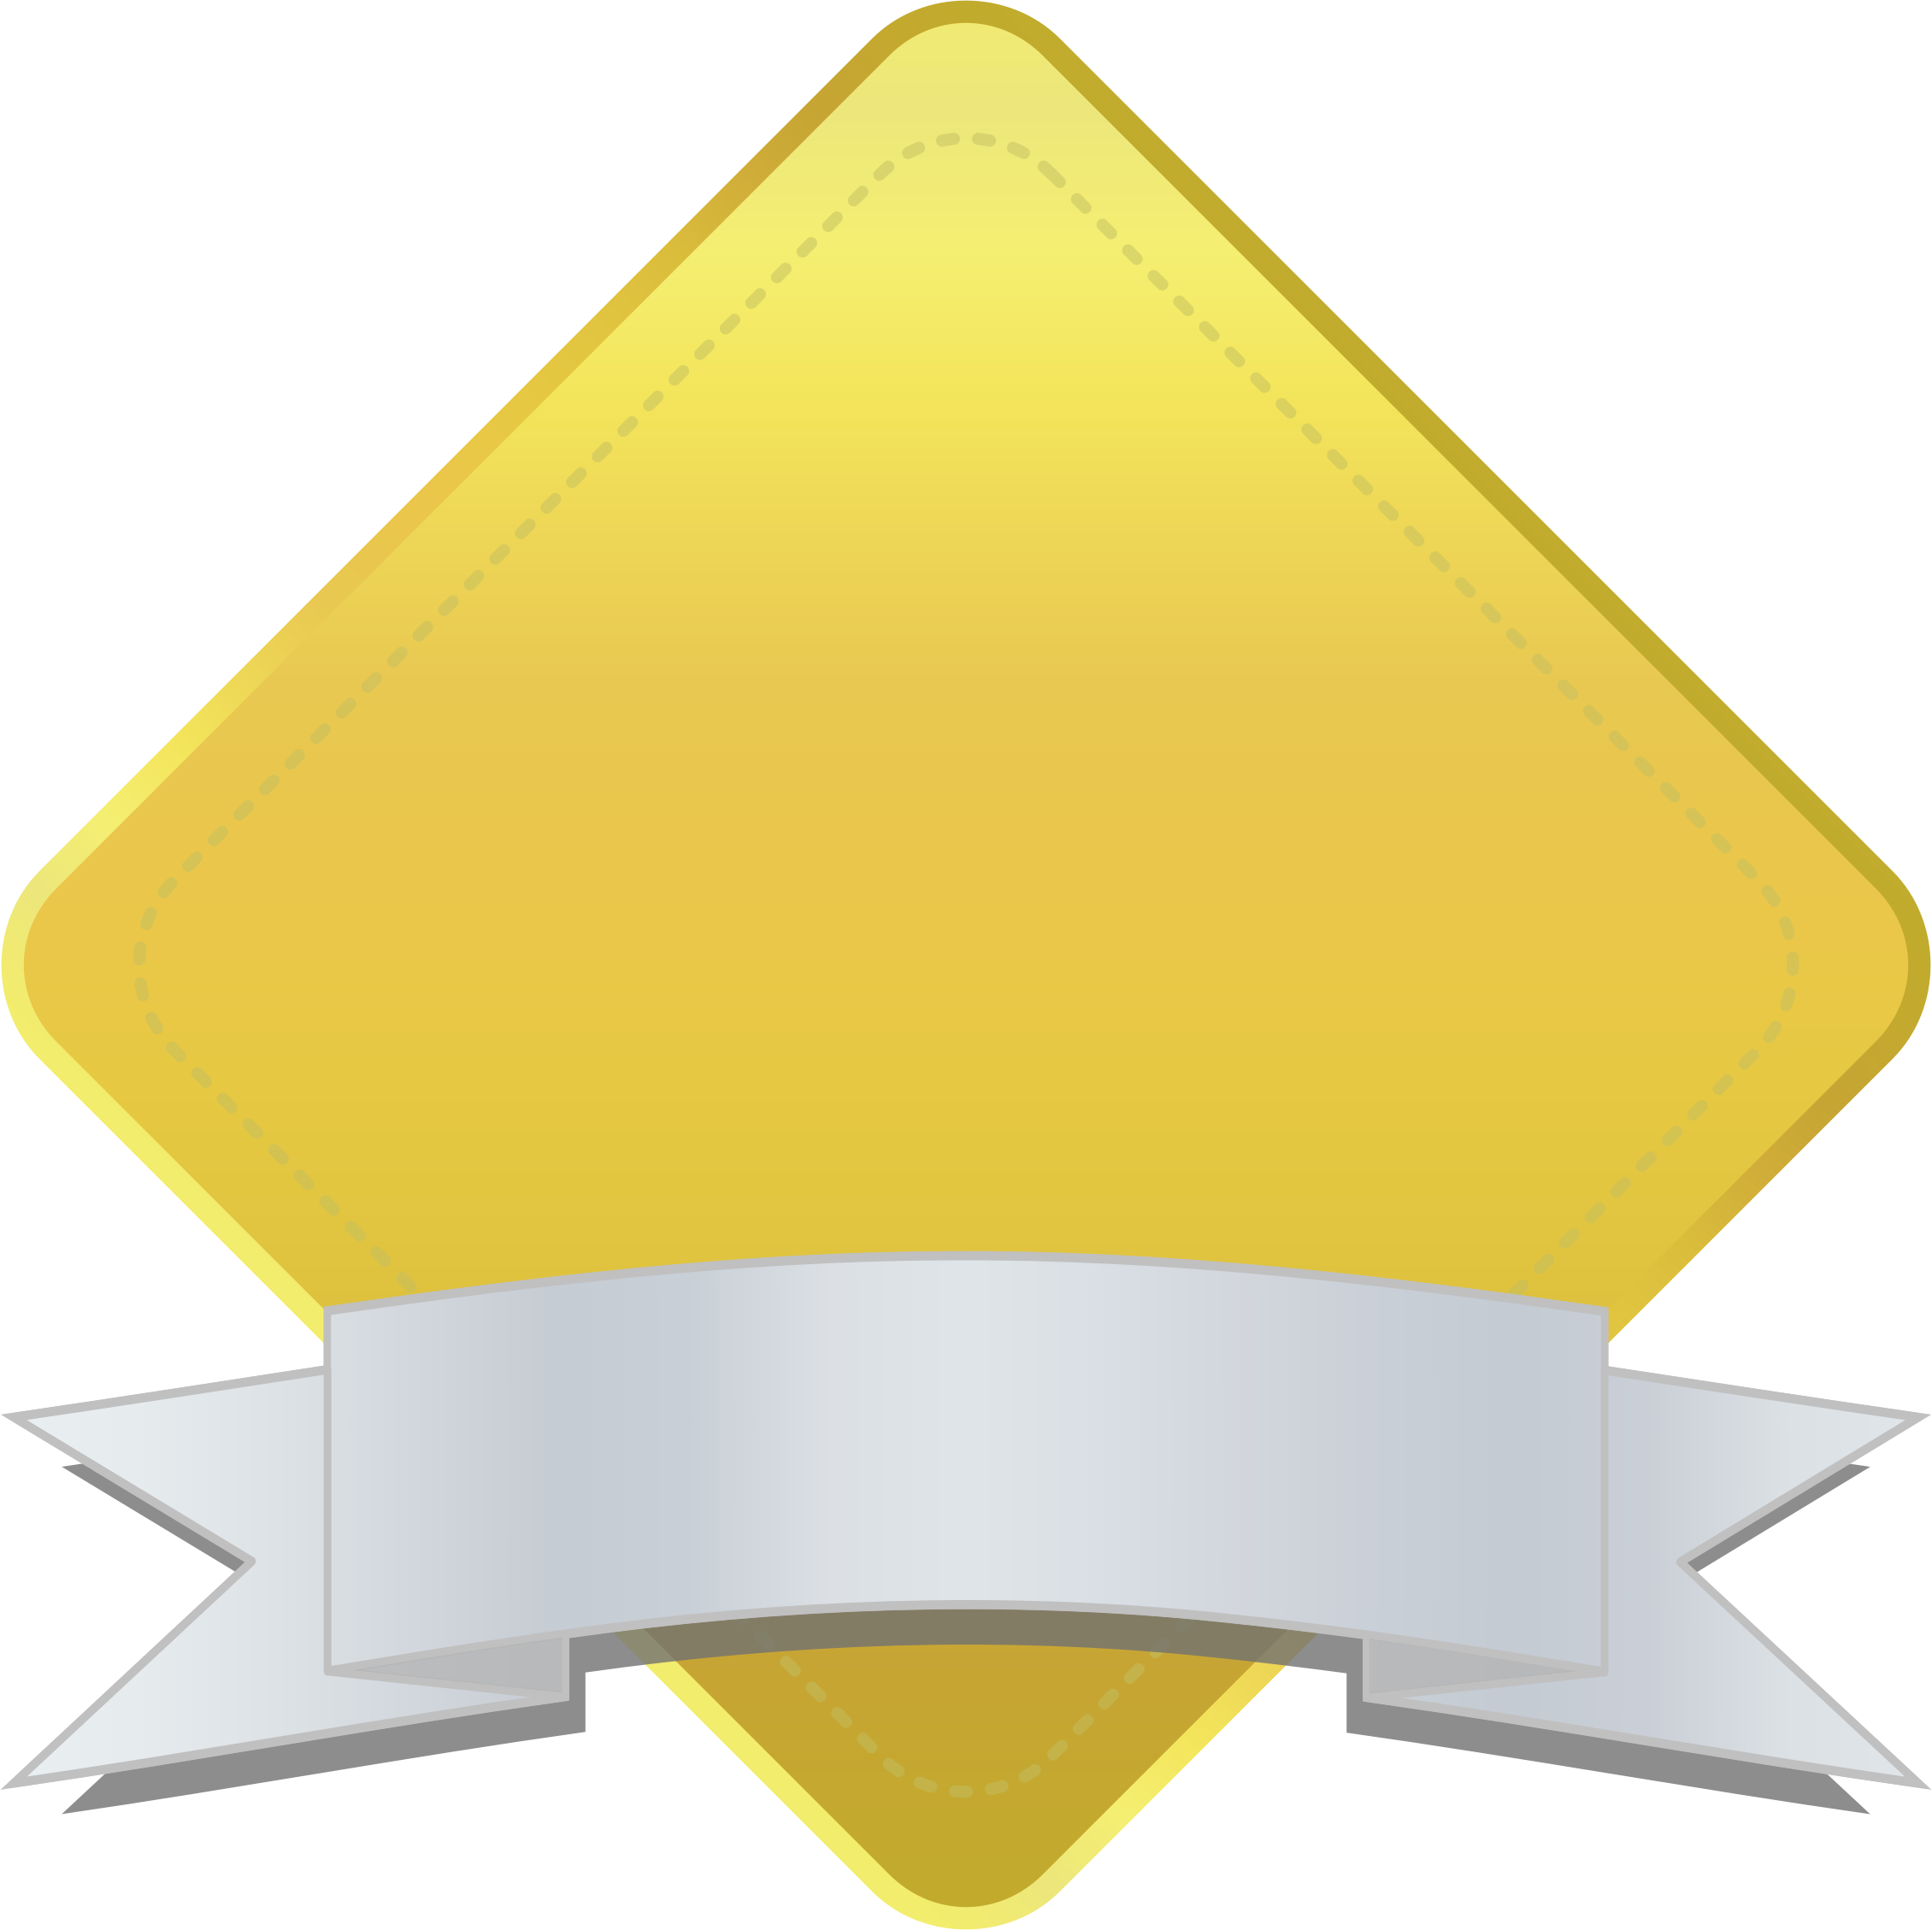 Banner big image png. Diamond clipart yellow diamond